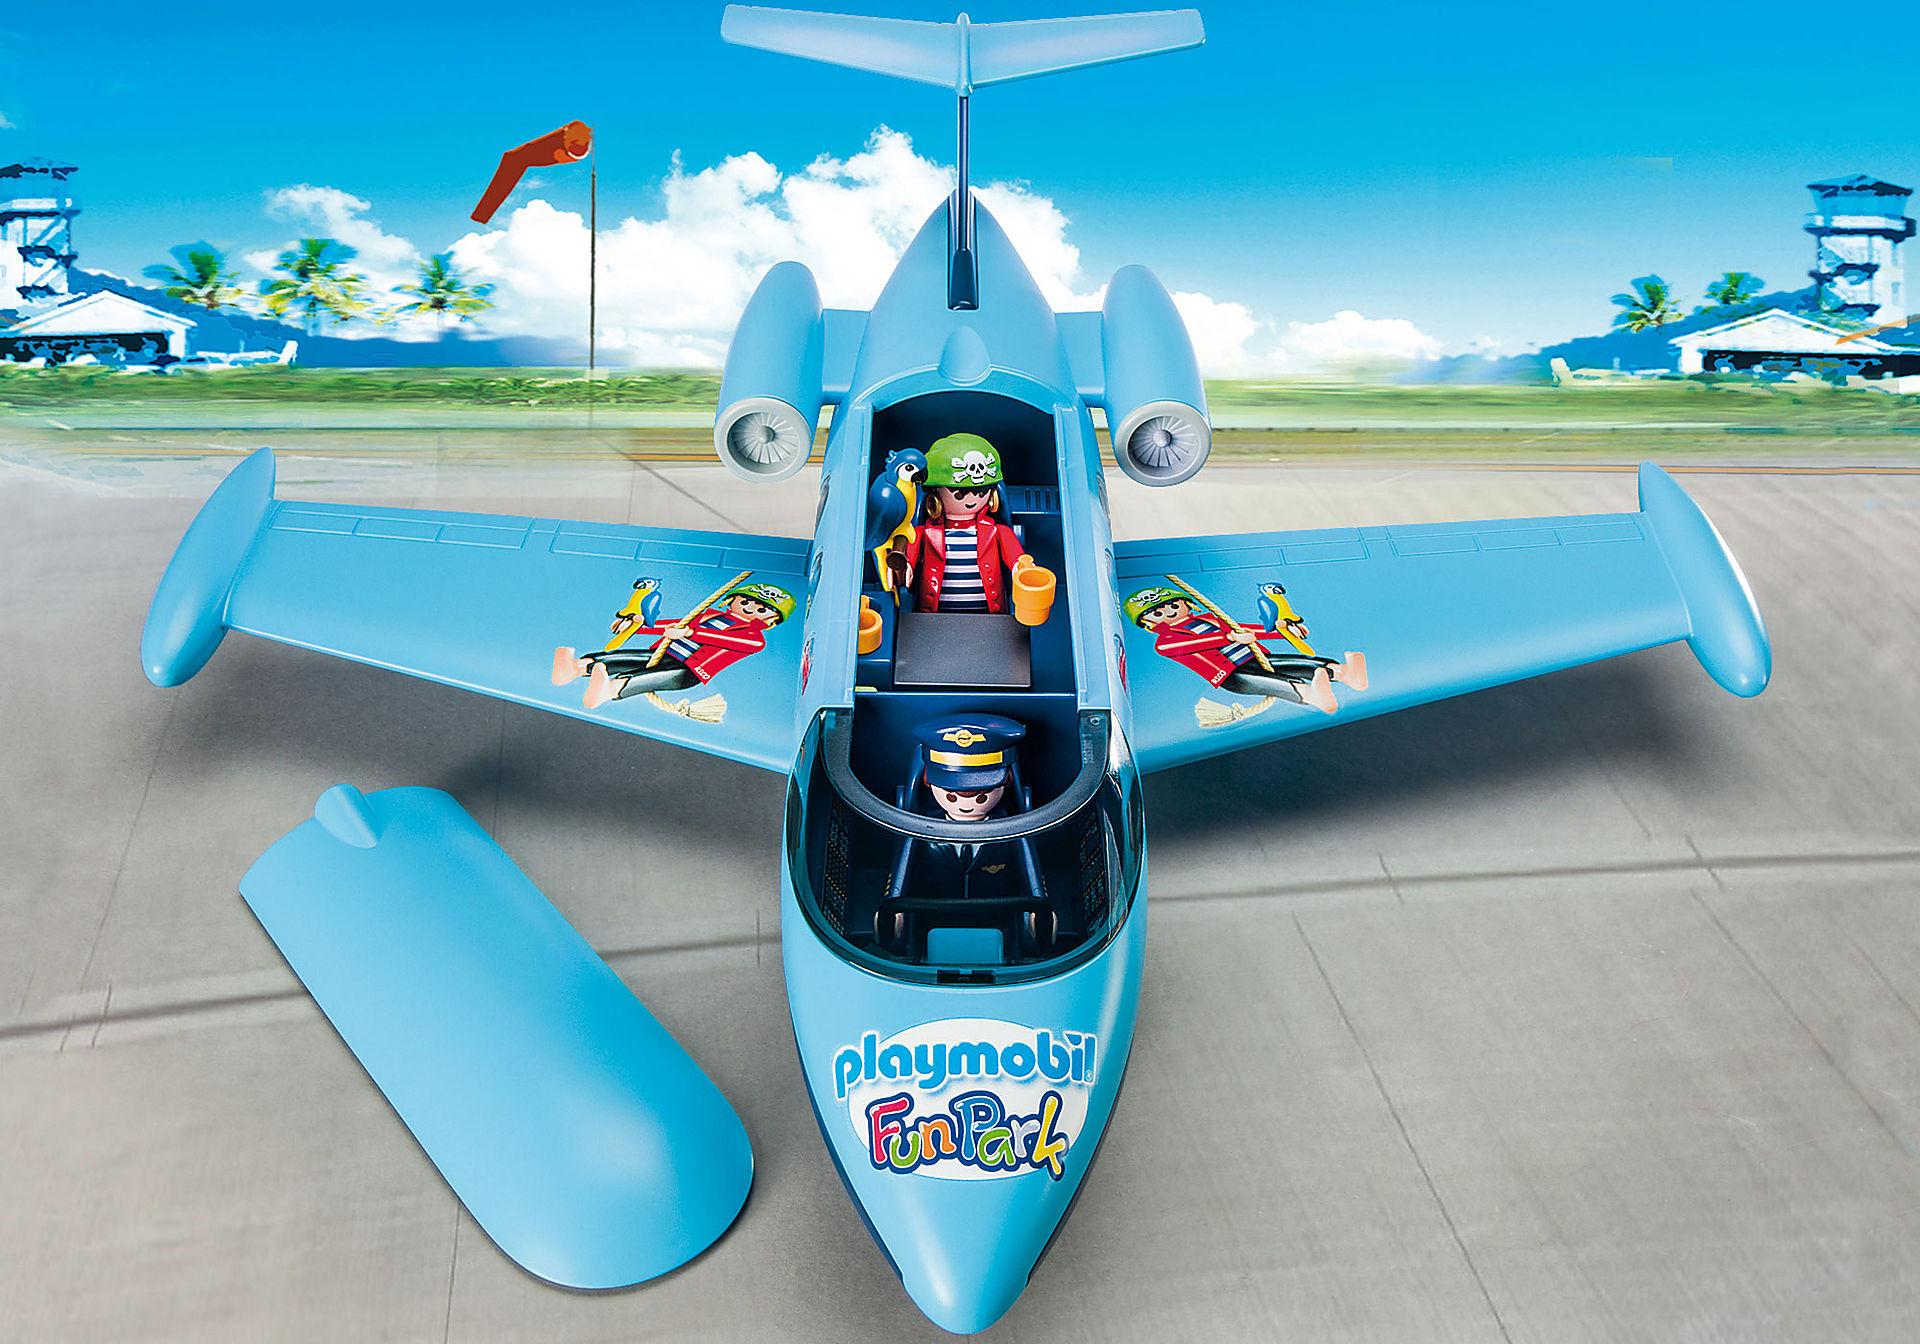 9366 PLAYMOBIL-FunPark Semesterflygplan  zoom image5